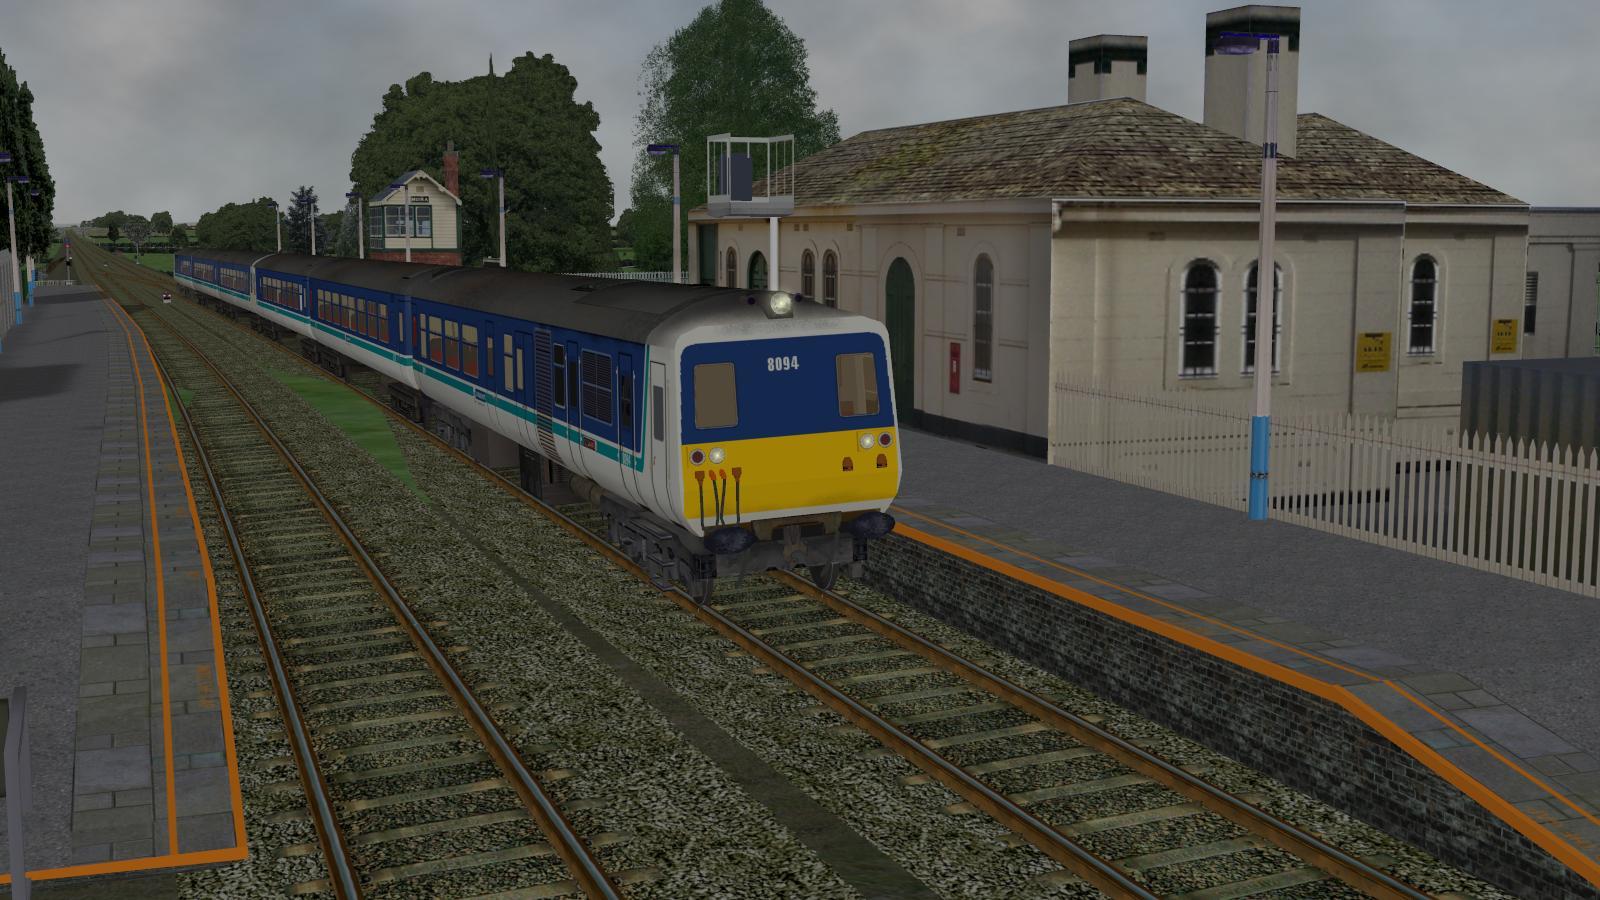 Train sims for railways in Ireland - Page 2 - Irish Railways Group